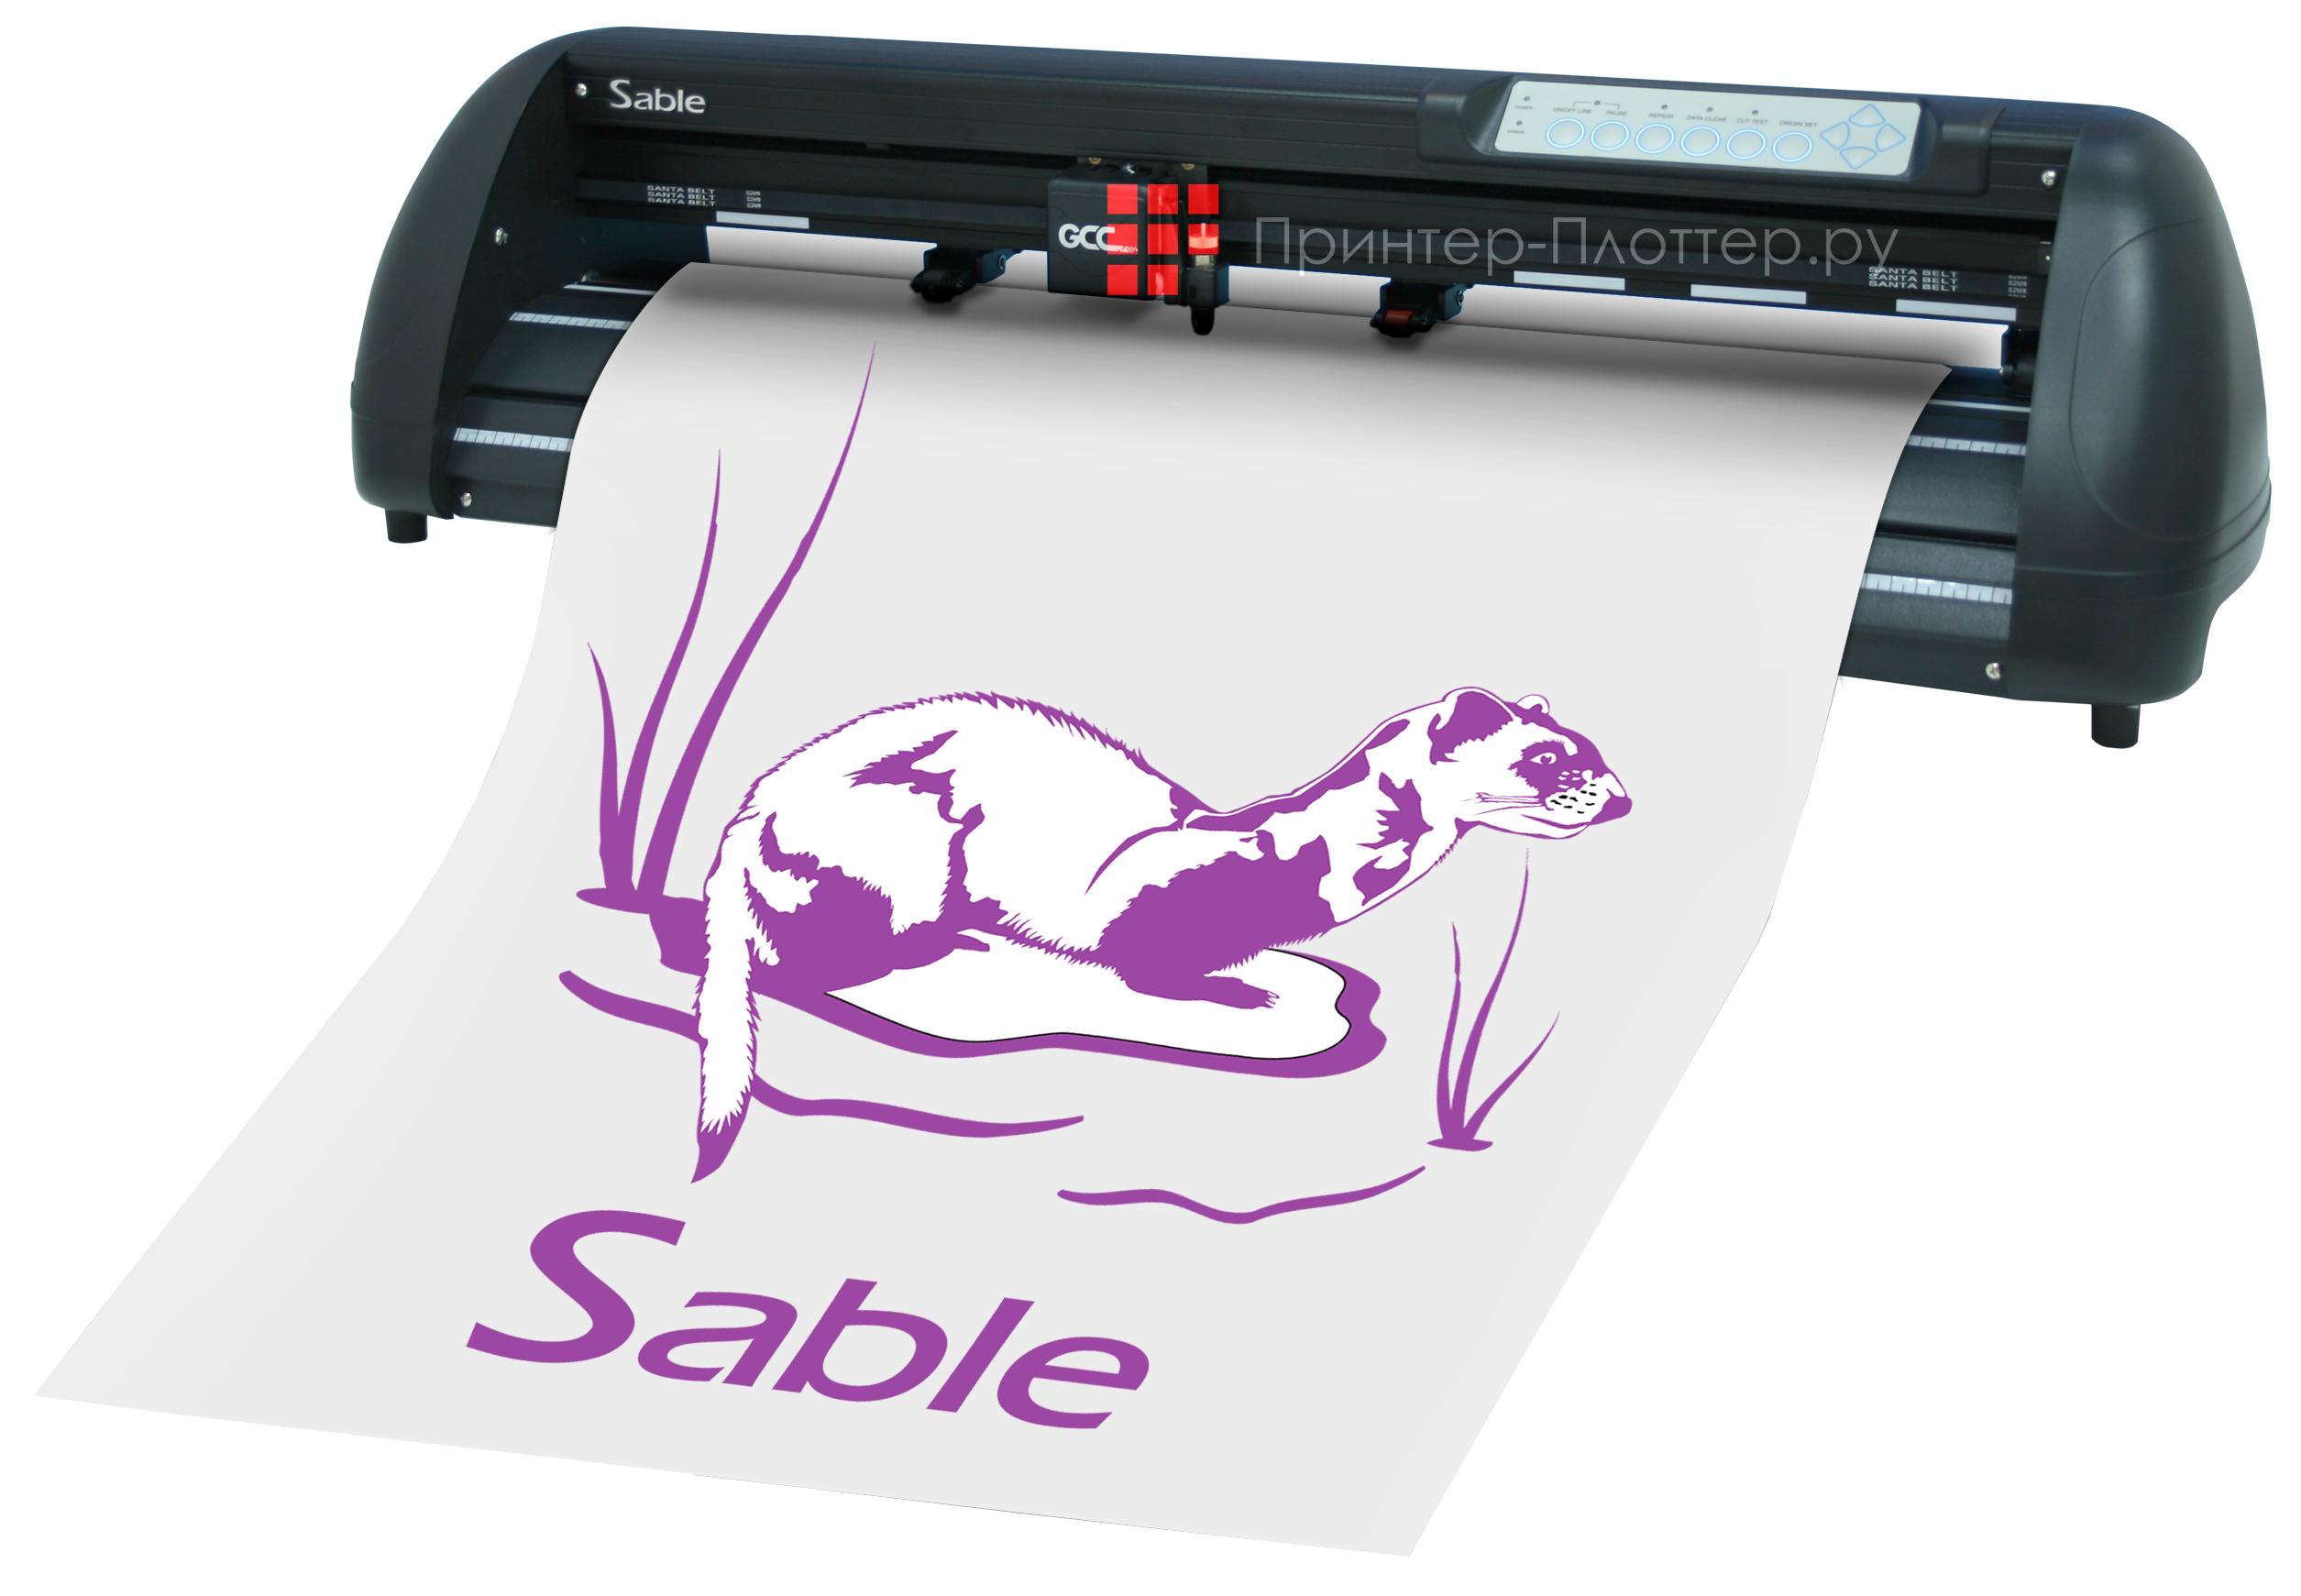 GCC Sable SB-60